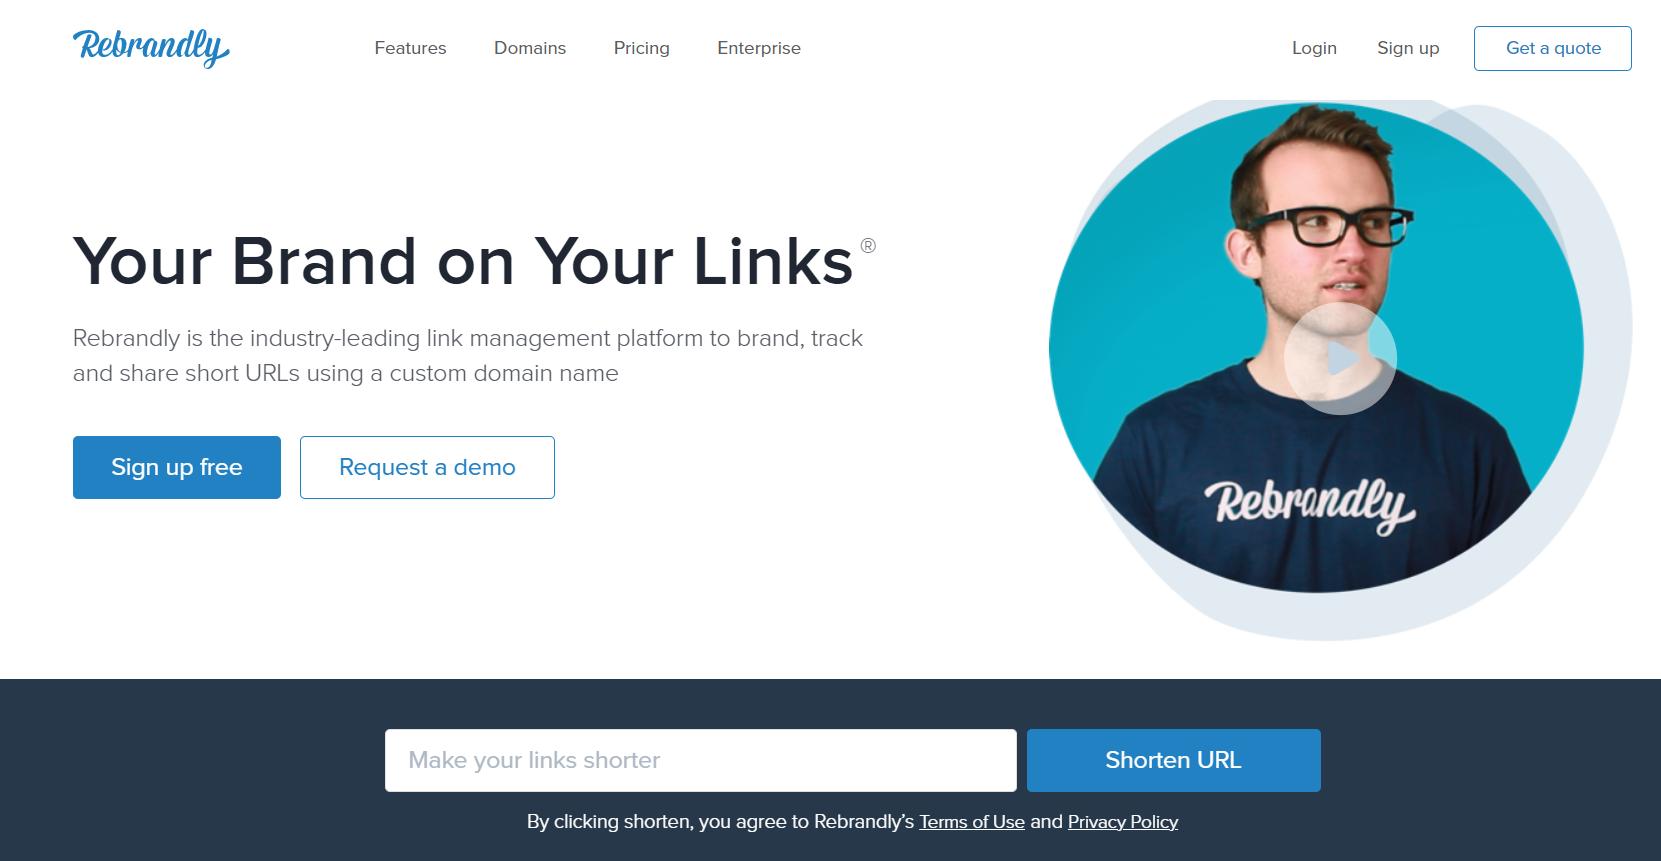 rut gon link Rebrandly